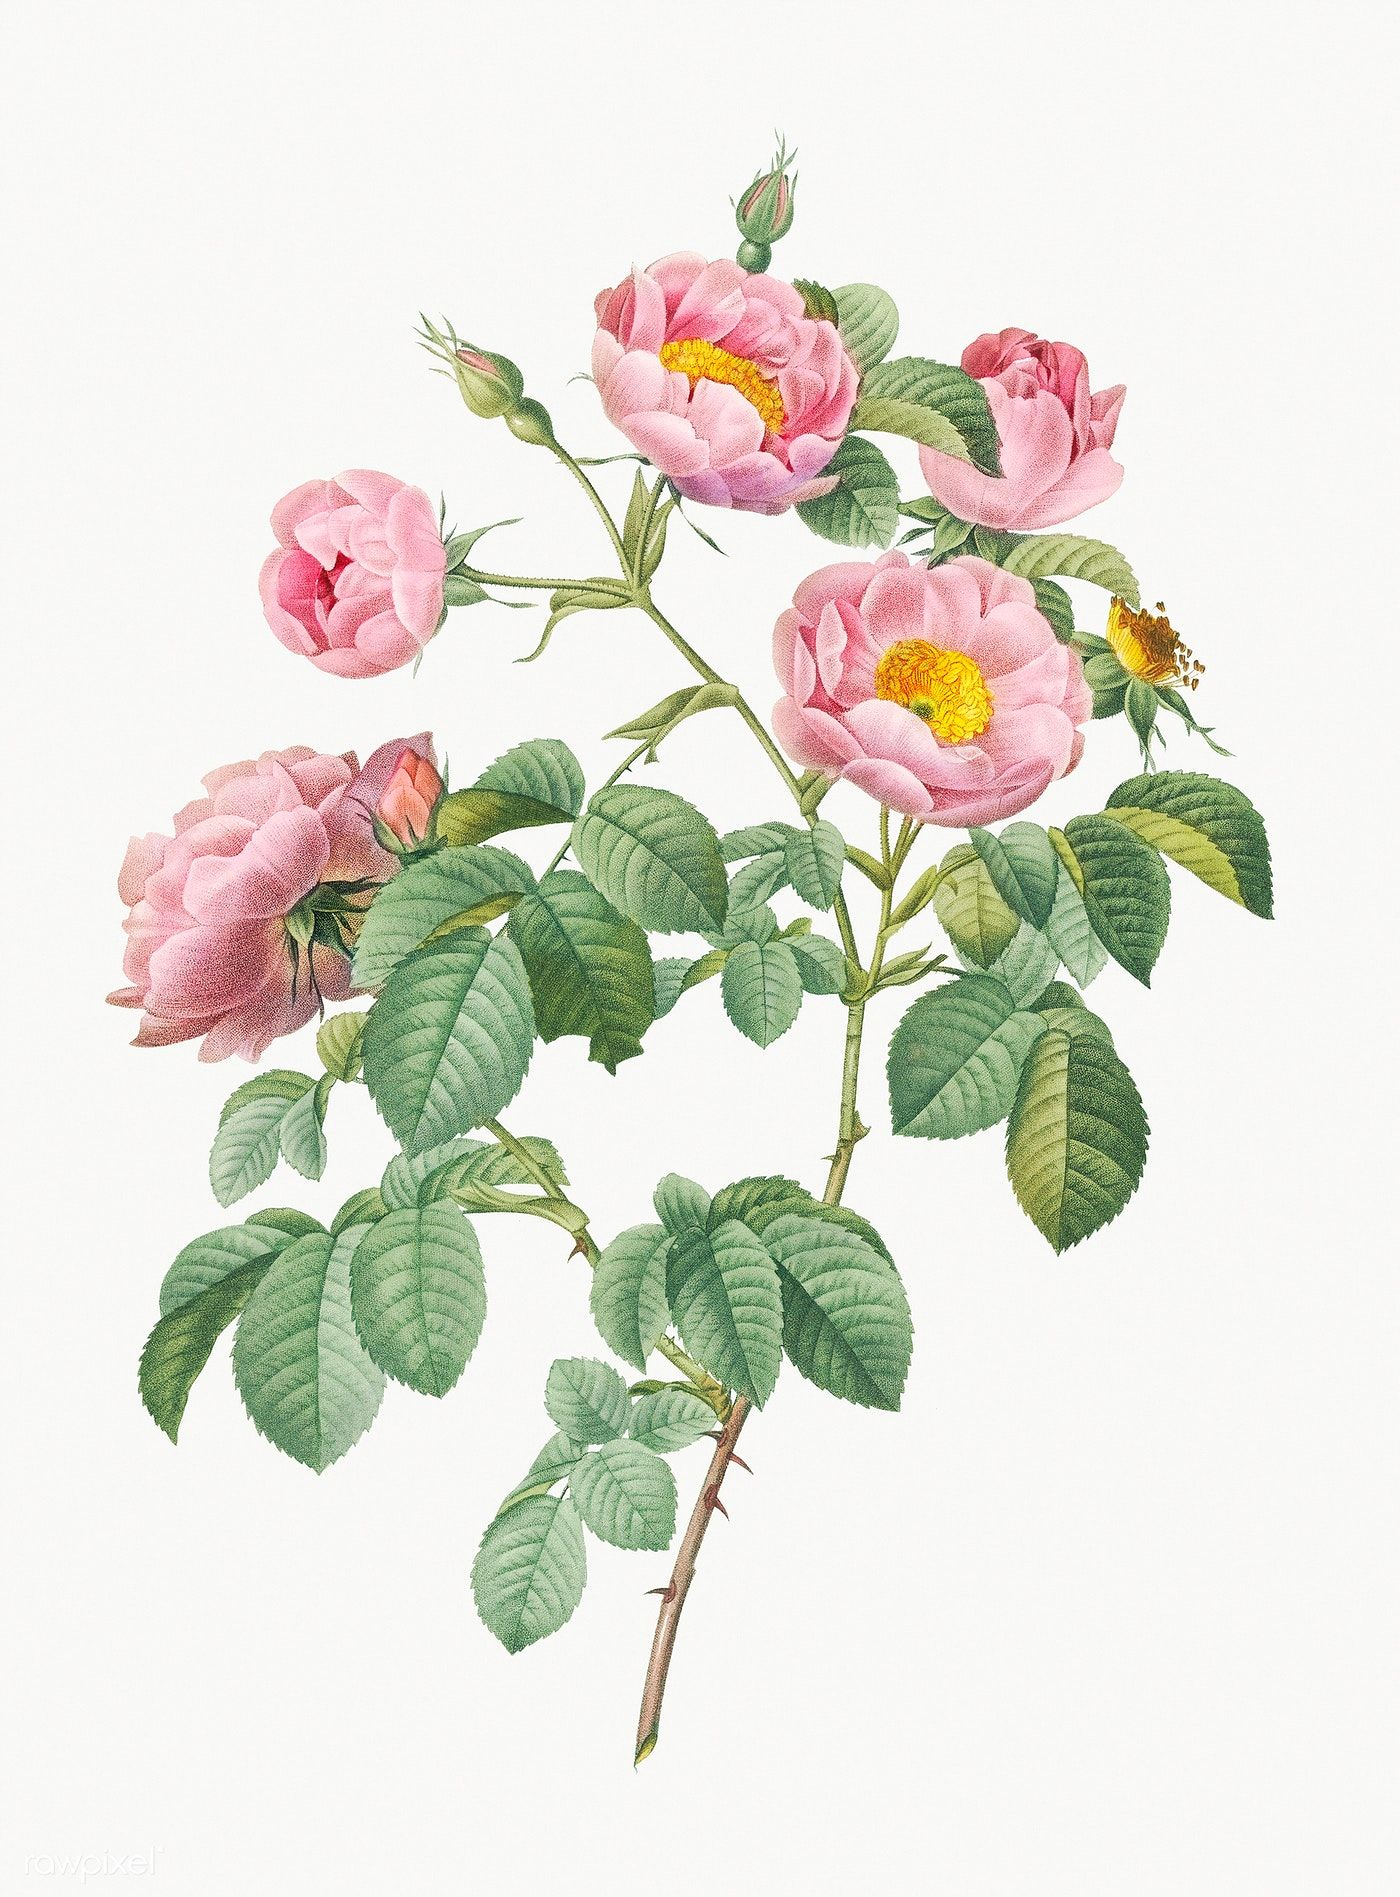 Download Premium Illustration Of Rosebush With Soft Leaves Illustration Rosebush Leaves Illustration Flower Illustration